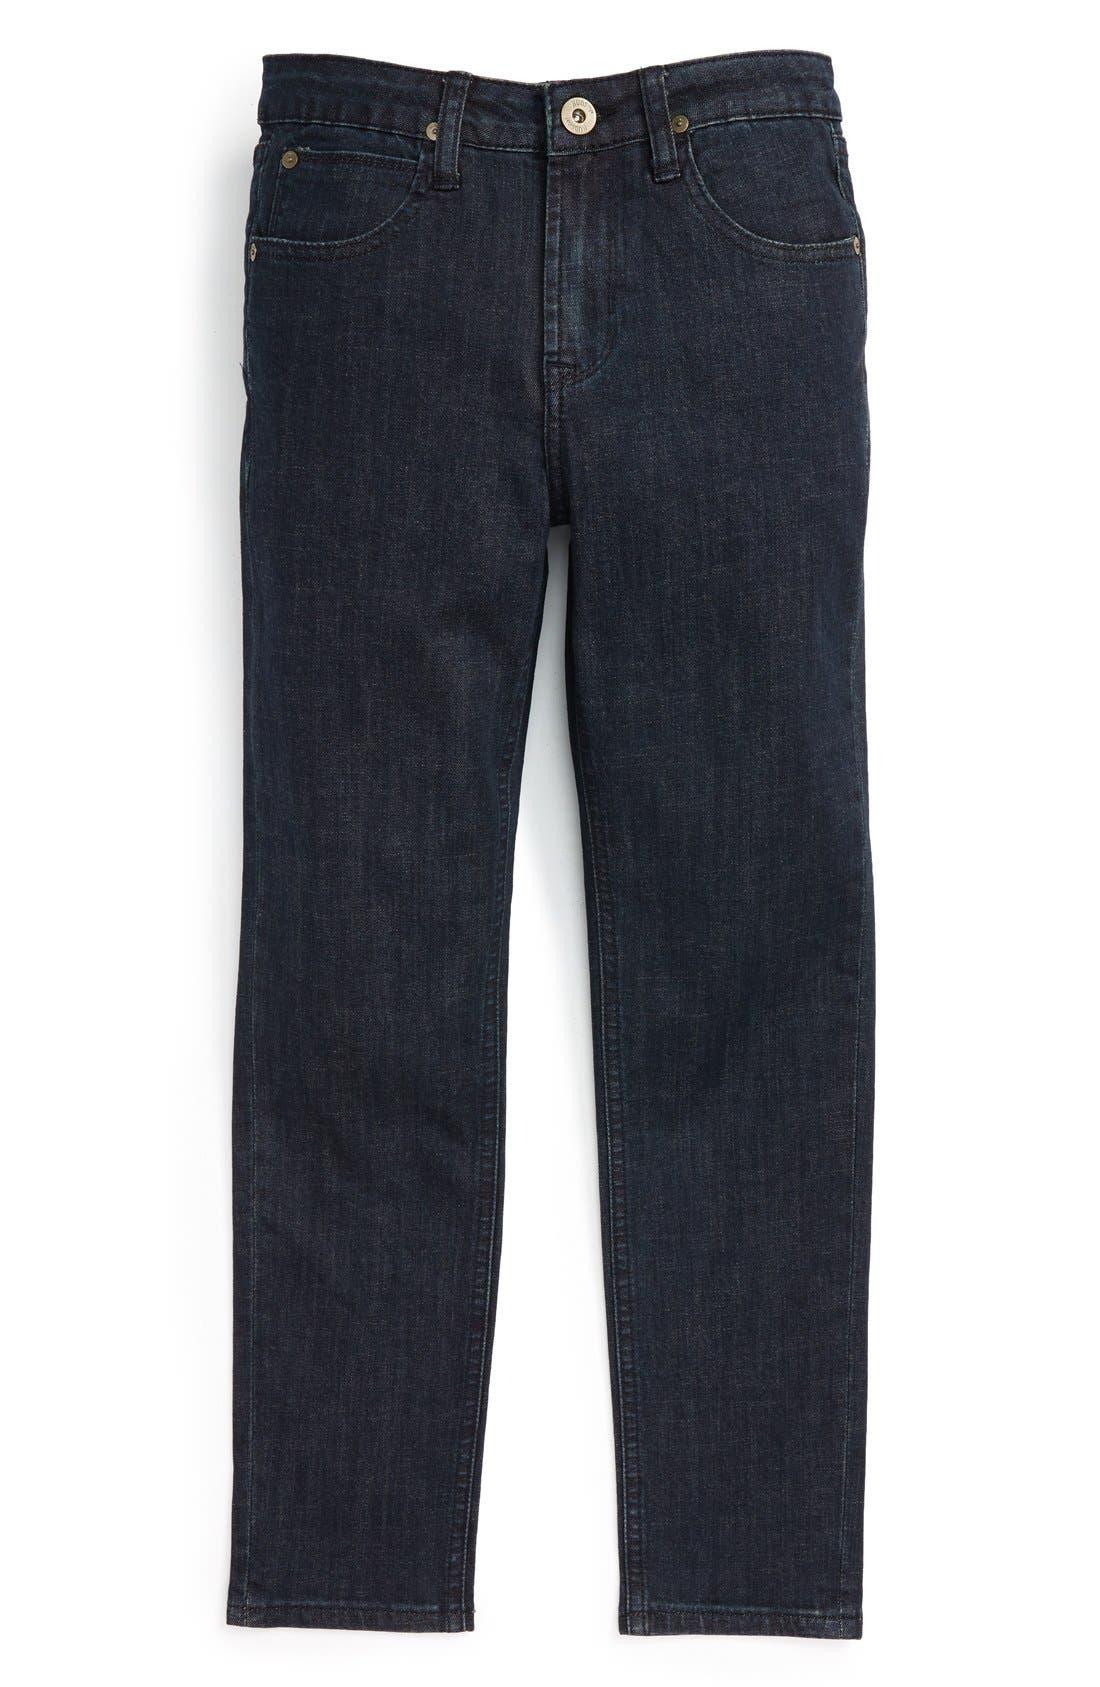 Jagger Slim Fit Straight Leg Jeans,                         Main,                         color, Midnight Raw